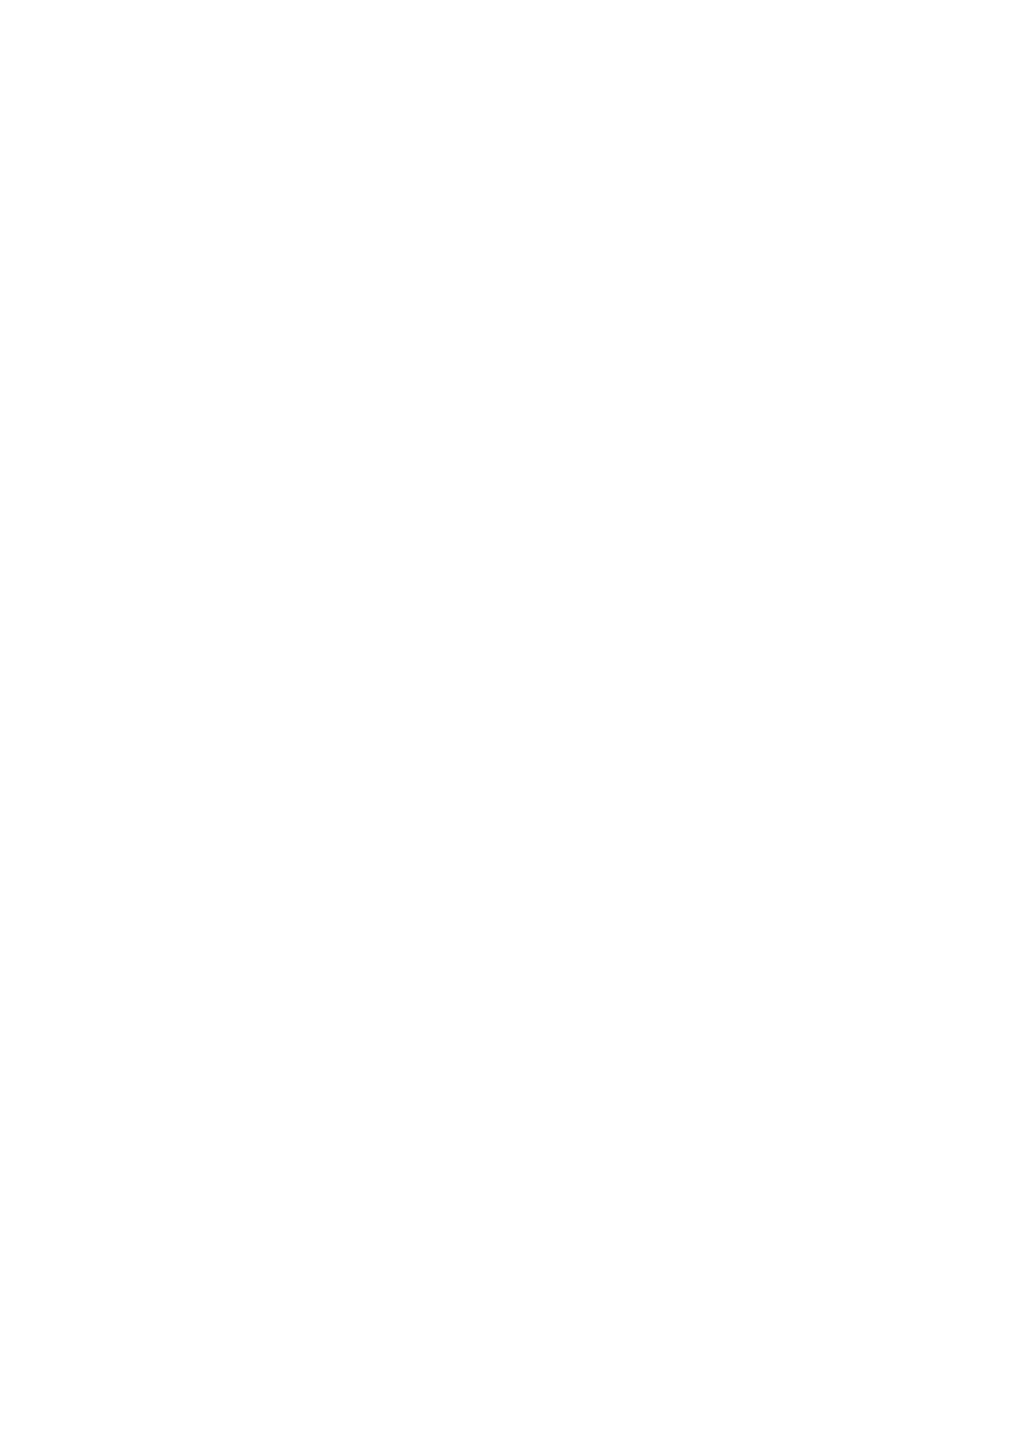 bbdnitm-1